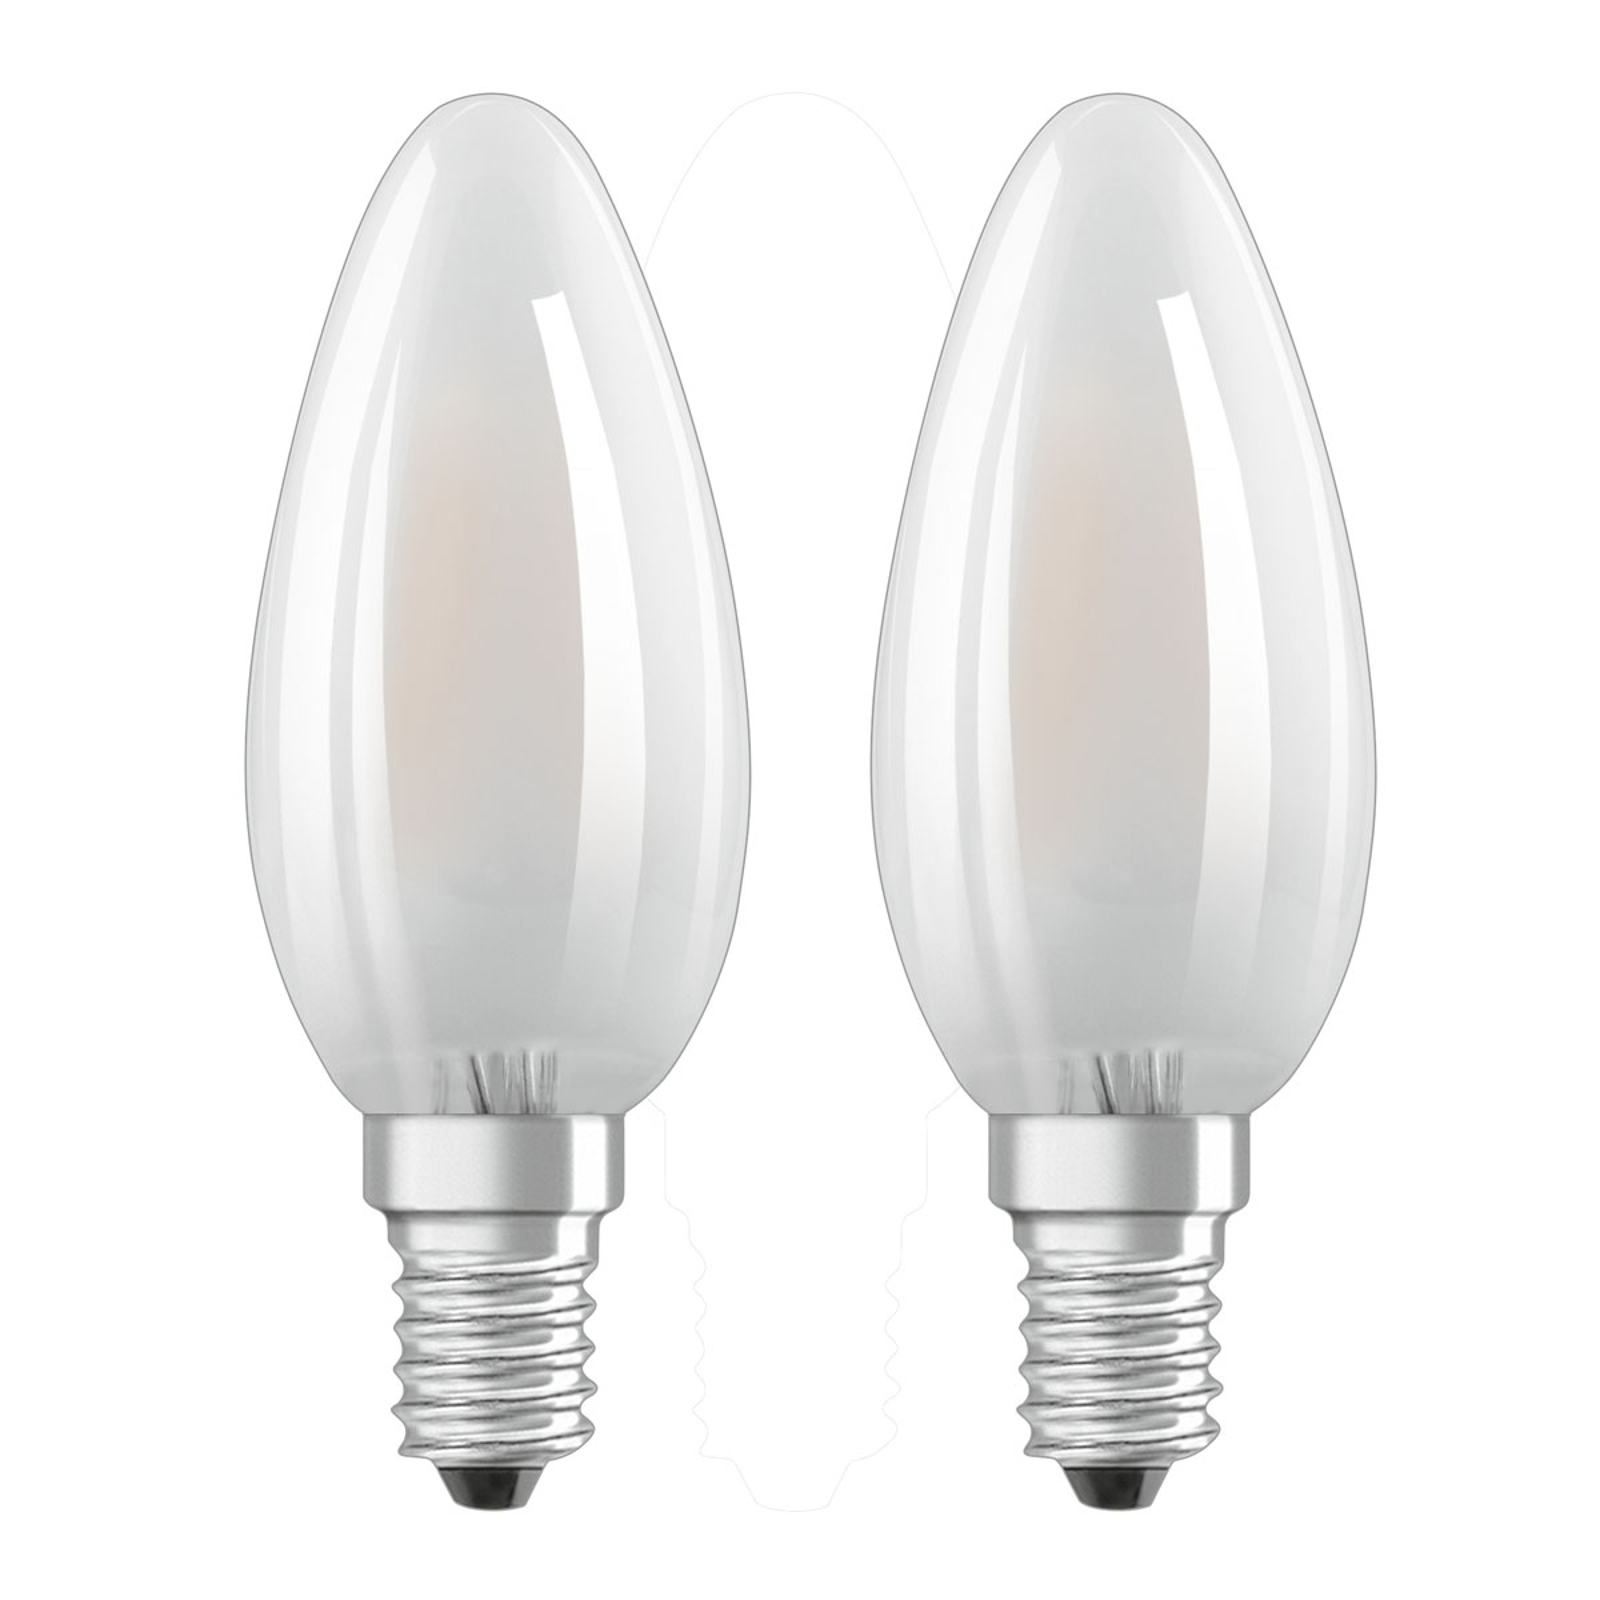 OSRAM-LED-kynttilälamppu E14 4W 2 kpl/pakkaus